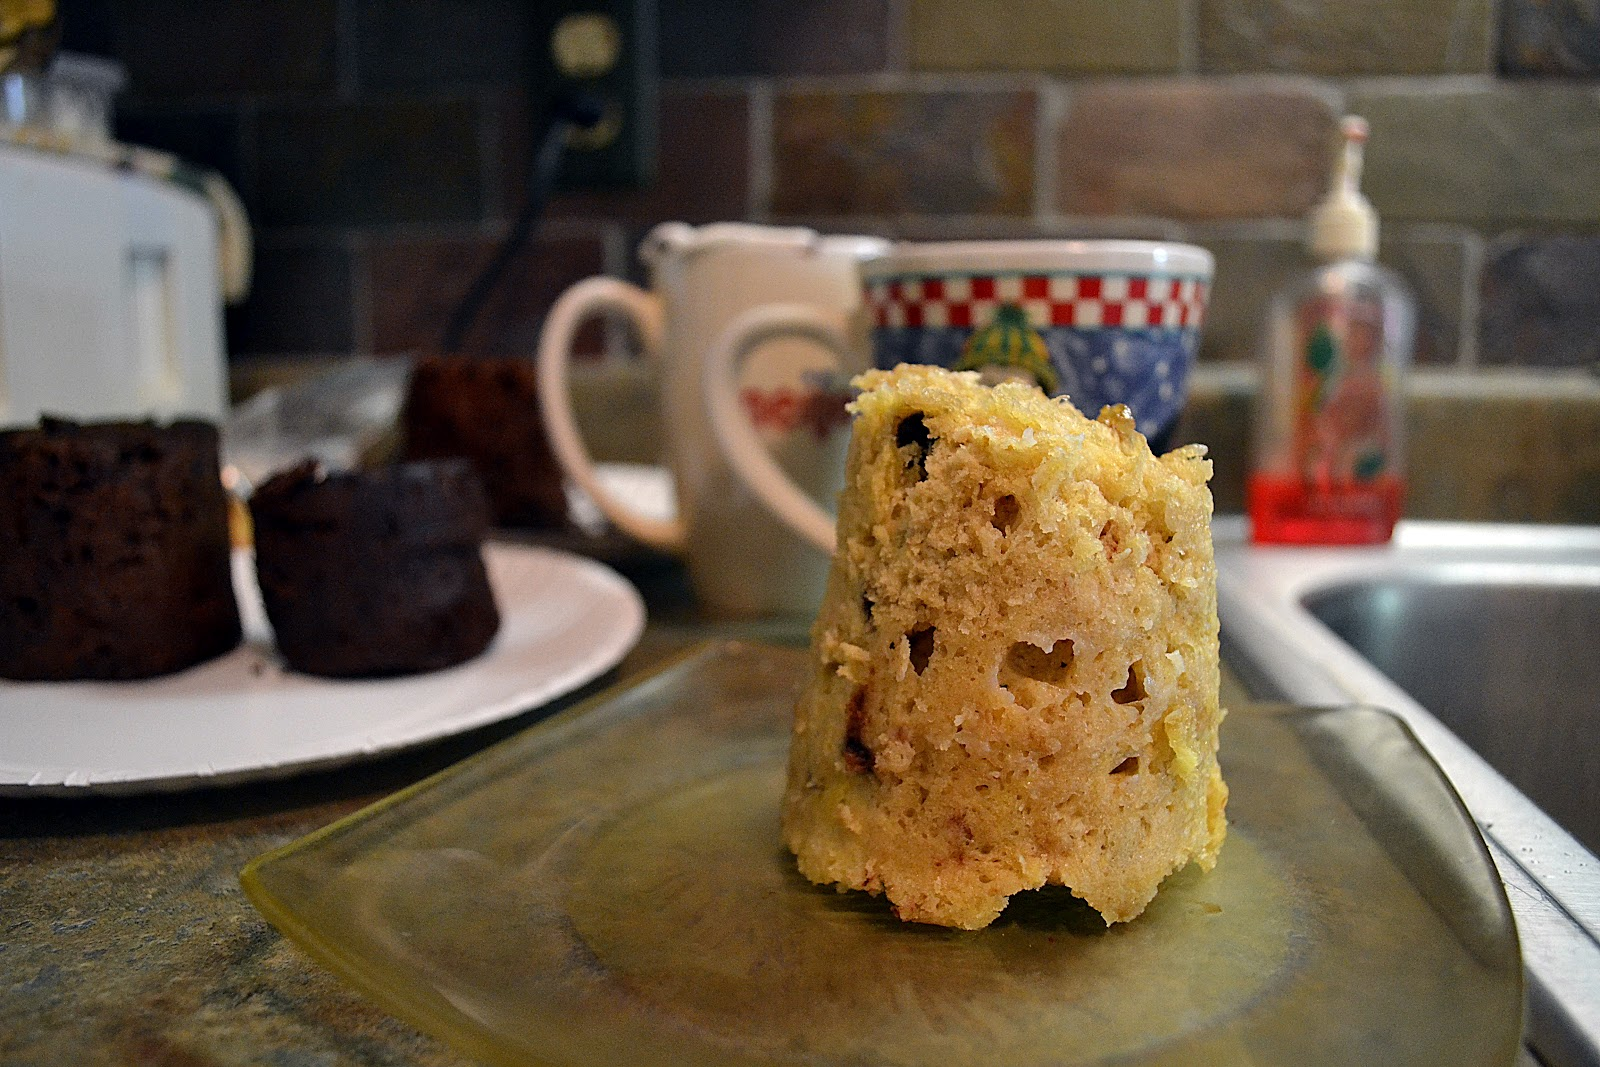 Simple Savory & Satisfying: Chocolate Chip Cookie Dough ...